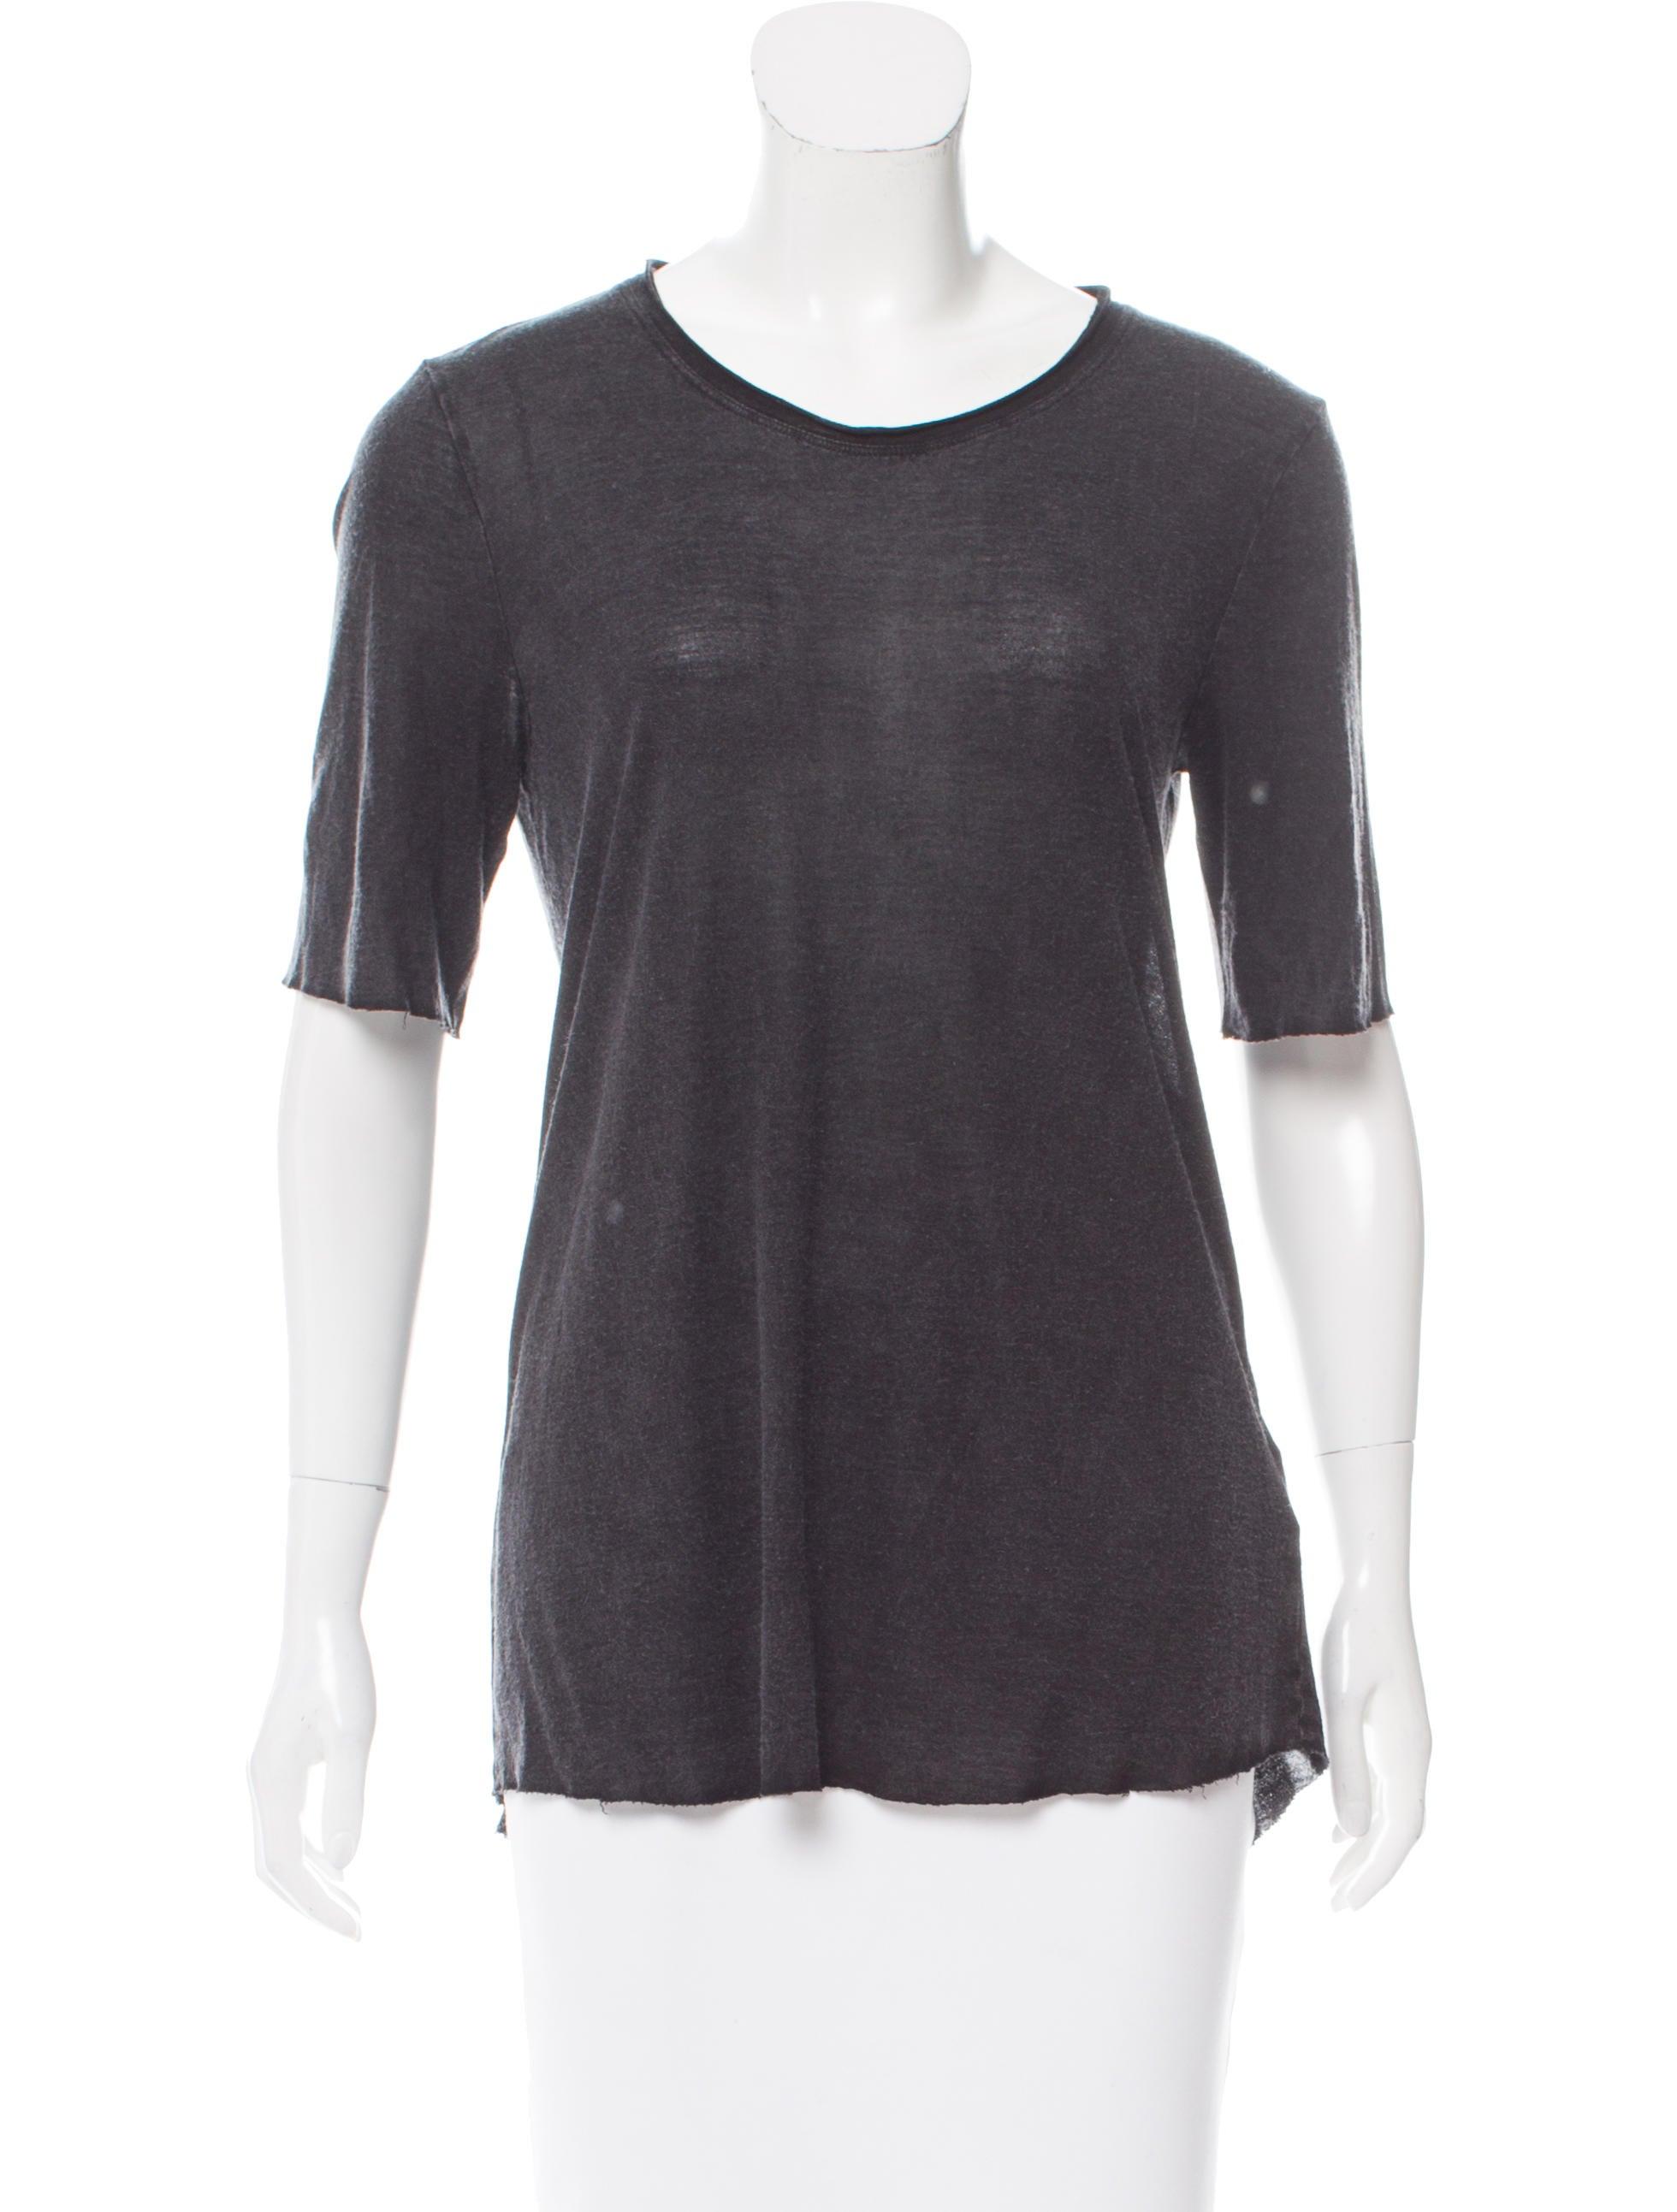 Raquel Allegra Scoop Neck High Low T Shirt W Tags